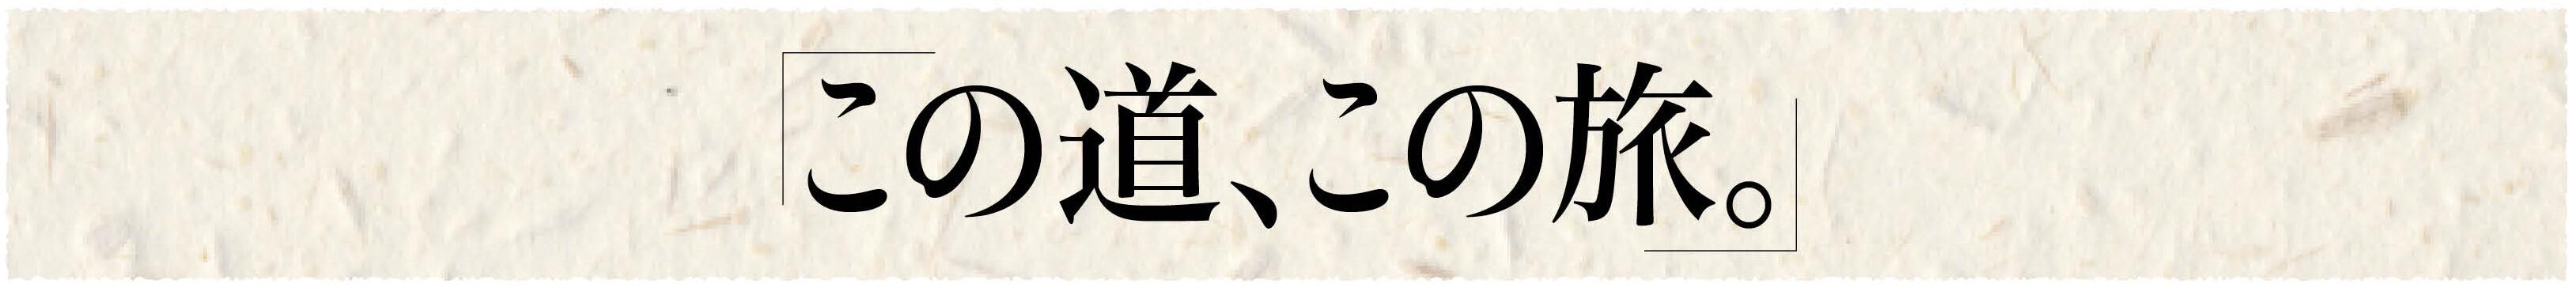 【YANASE presents 】「この道、この旅。」~佐賀県・国道204号線 編 - %e3%82%bf%e3%82%a4%e3%83%88%e3%83%ab_2